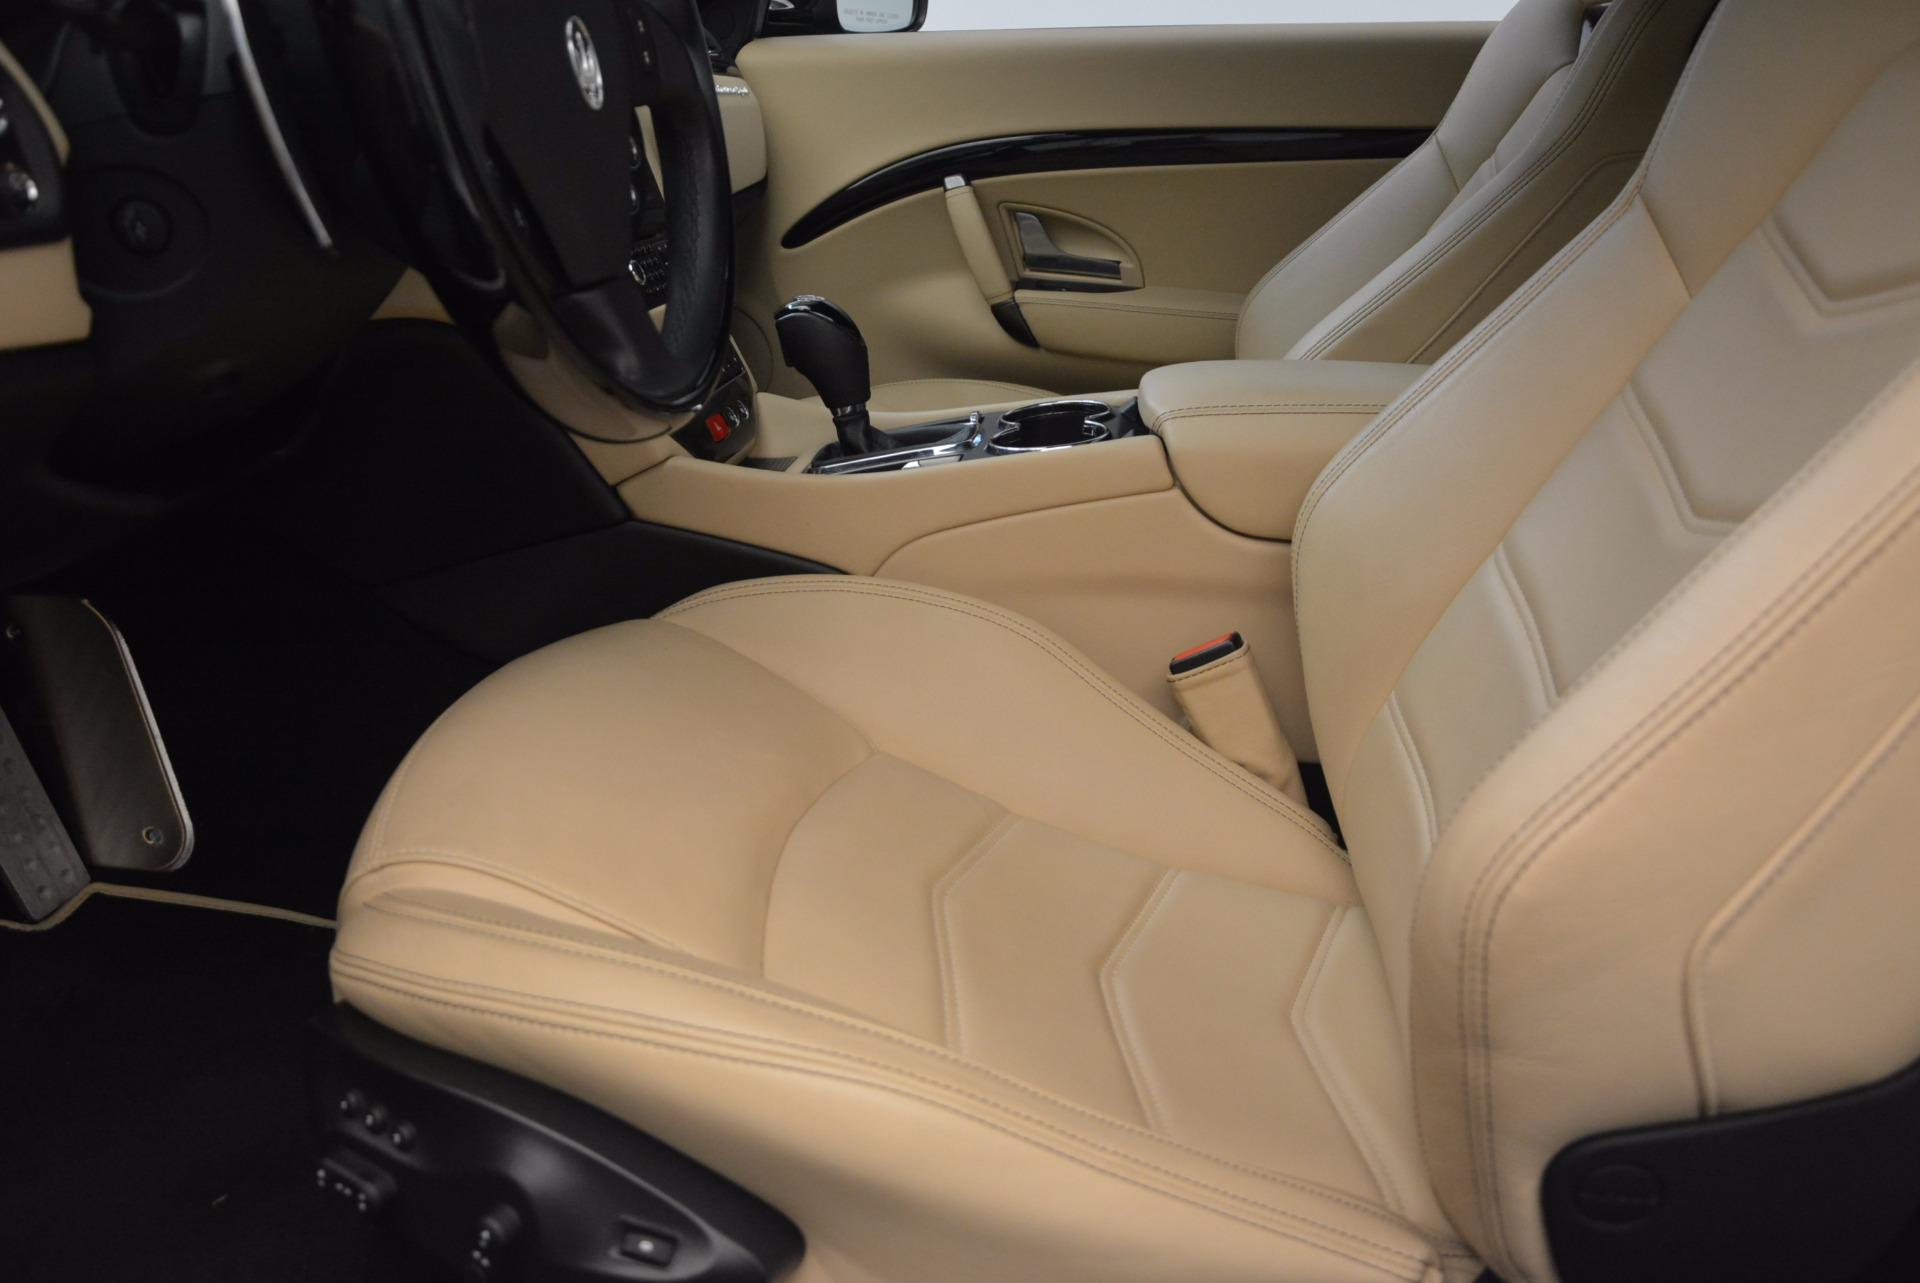 Used 2015 Maserati GranTurismo Sport Coupe For Sale In Westport, CT 1557_p14